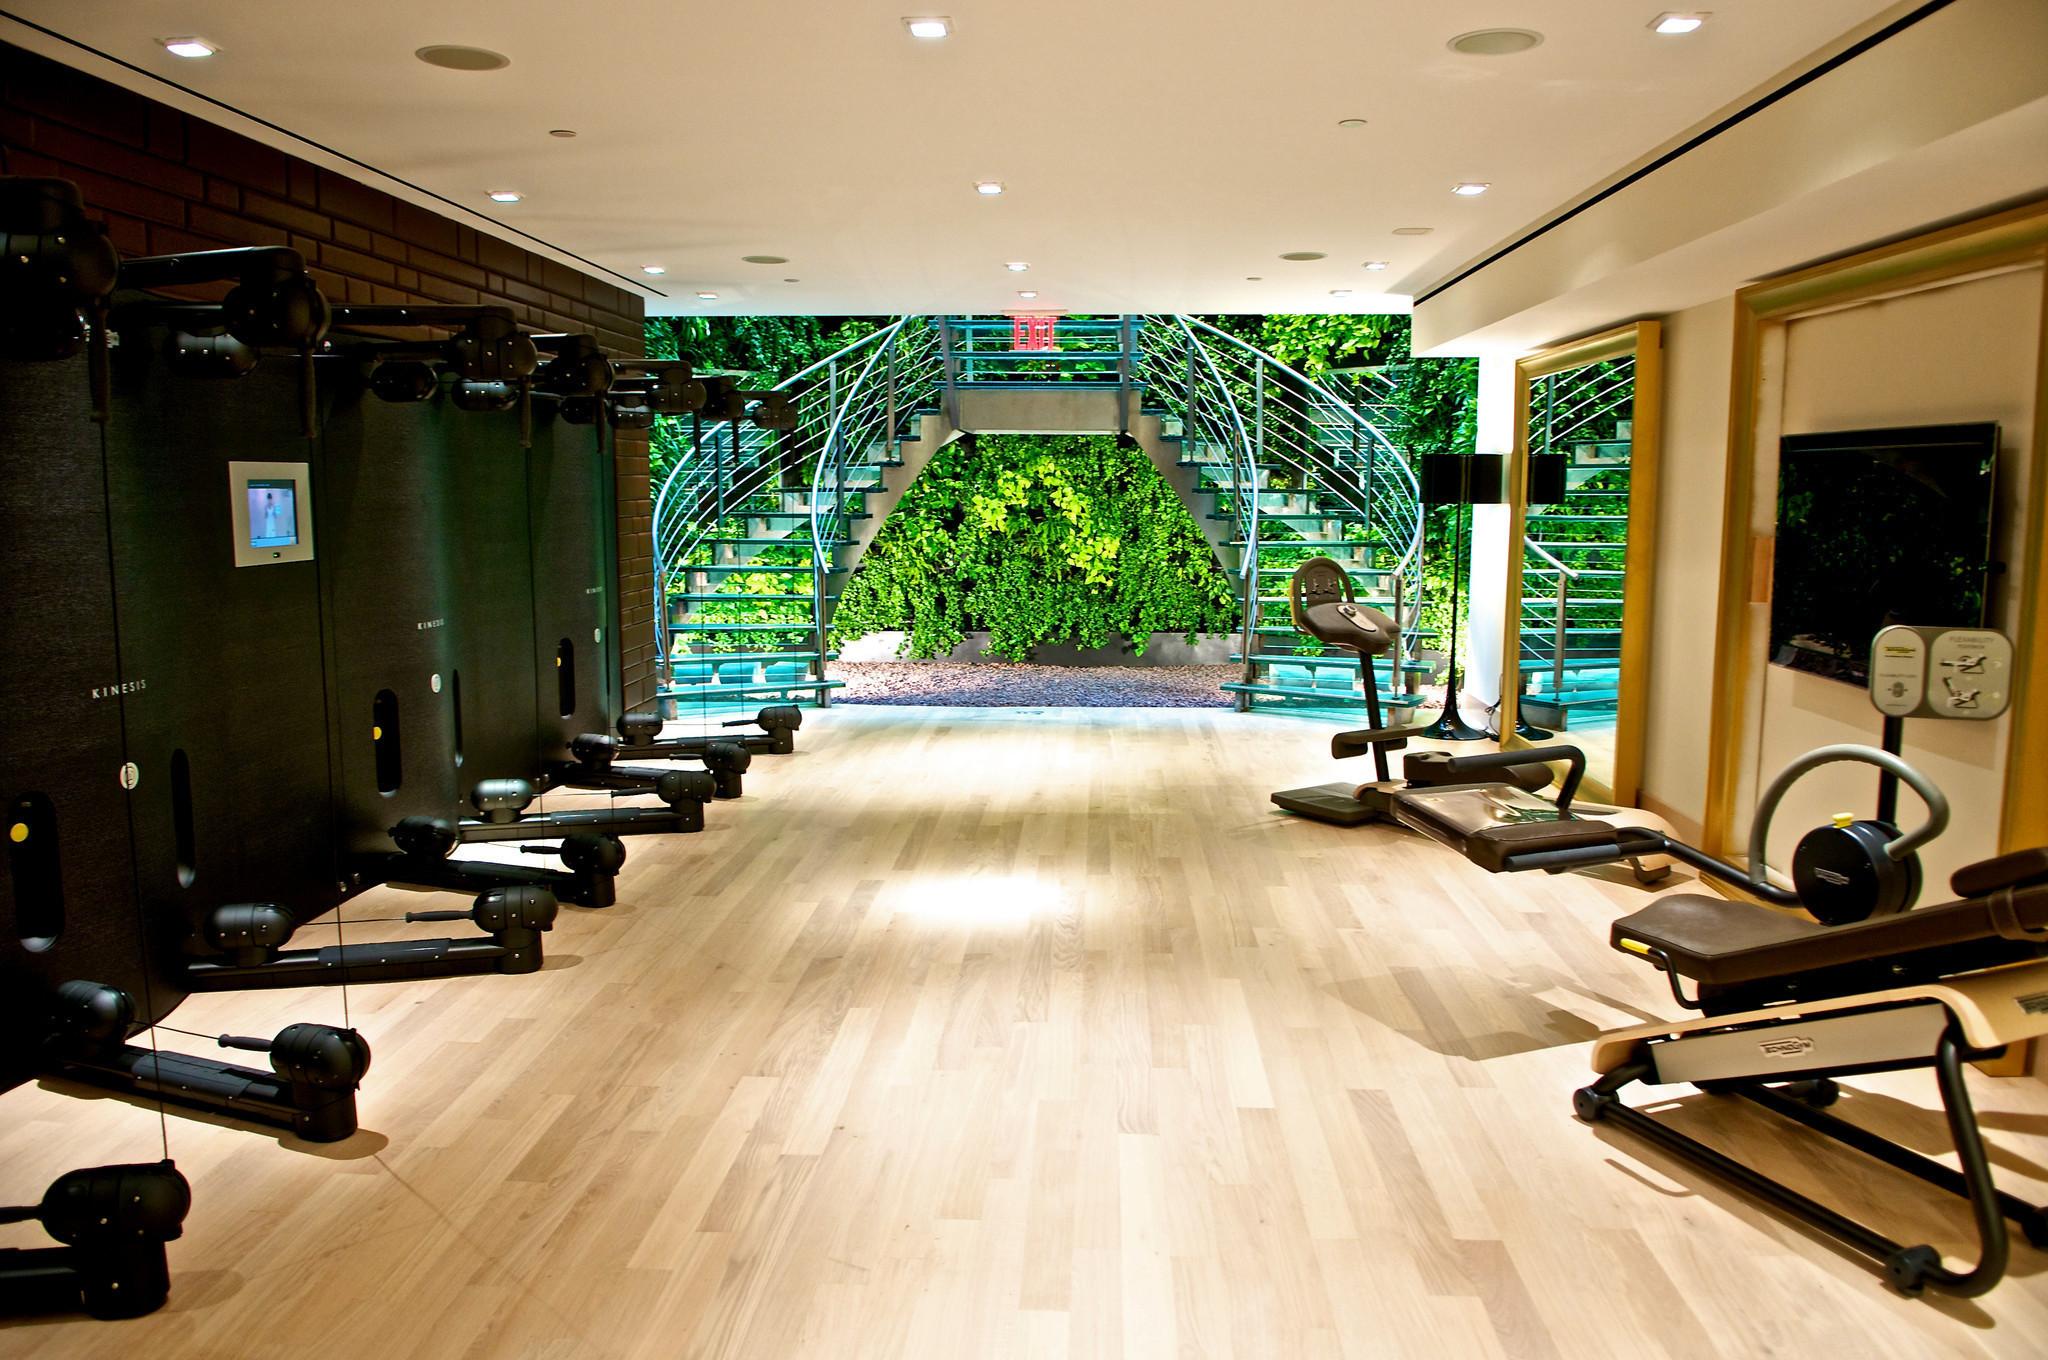 fitness for dumbbells home gyms make exercising a no brainer sun sentinel. Black Bedroom Furniture Sets. Home Design Ideas